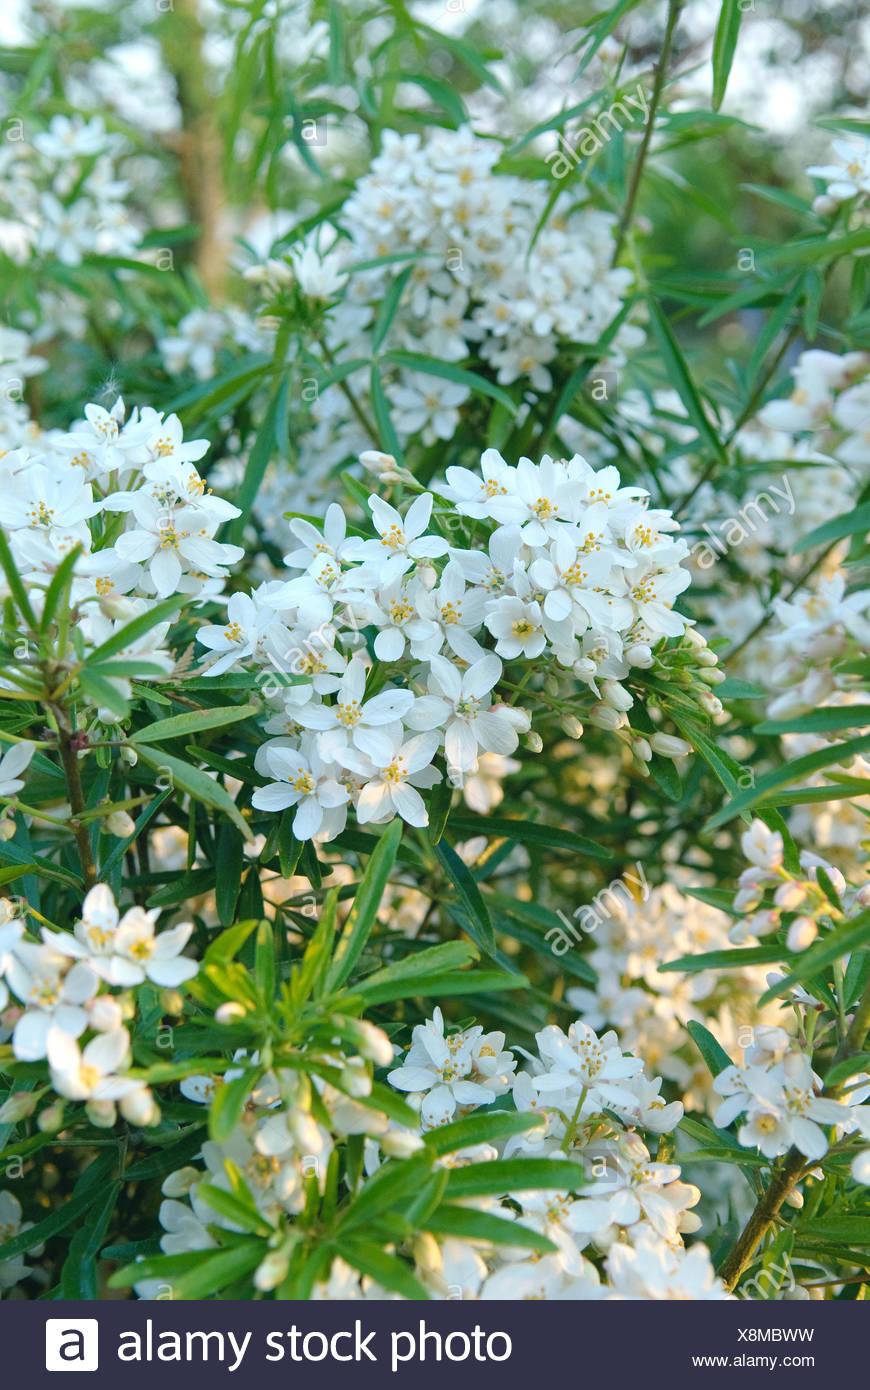 Oranger du Mexique (Choisya ternata 'Actec Pearl', Choisya ternata Actec Pearl, Pearl, Actec cultivar blooming Photo Stock